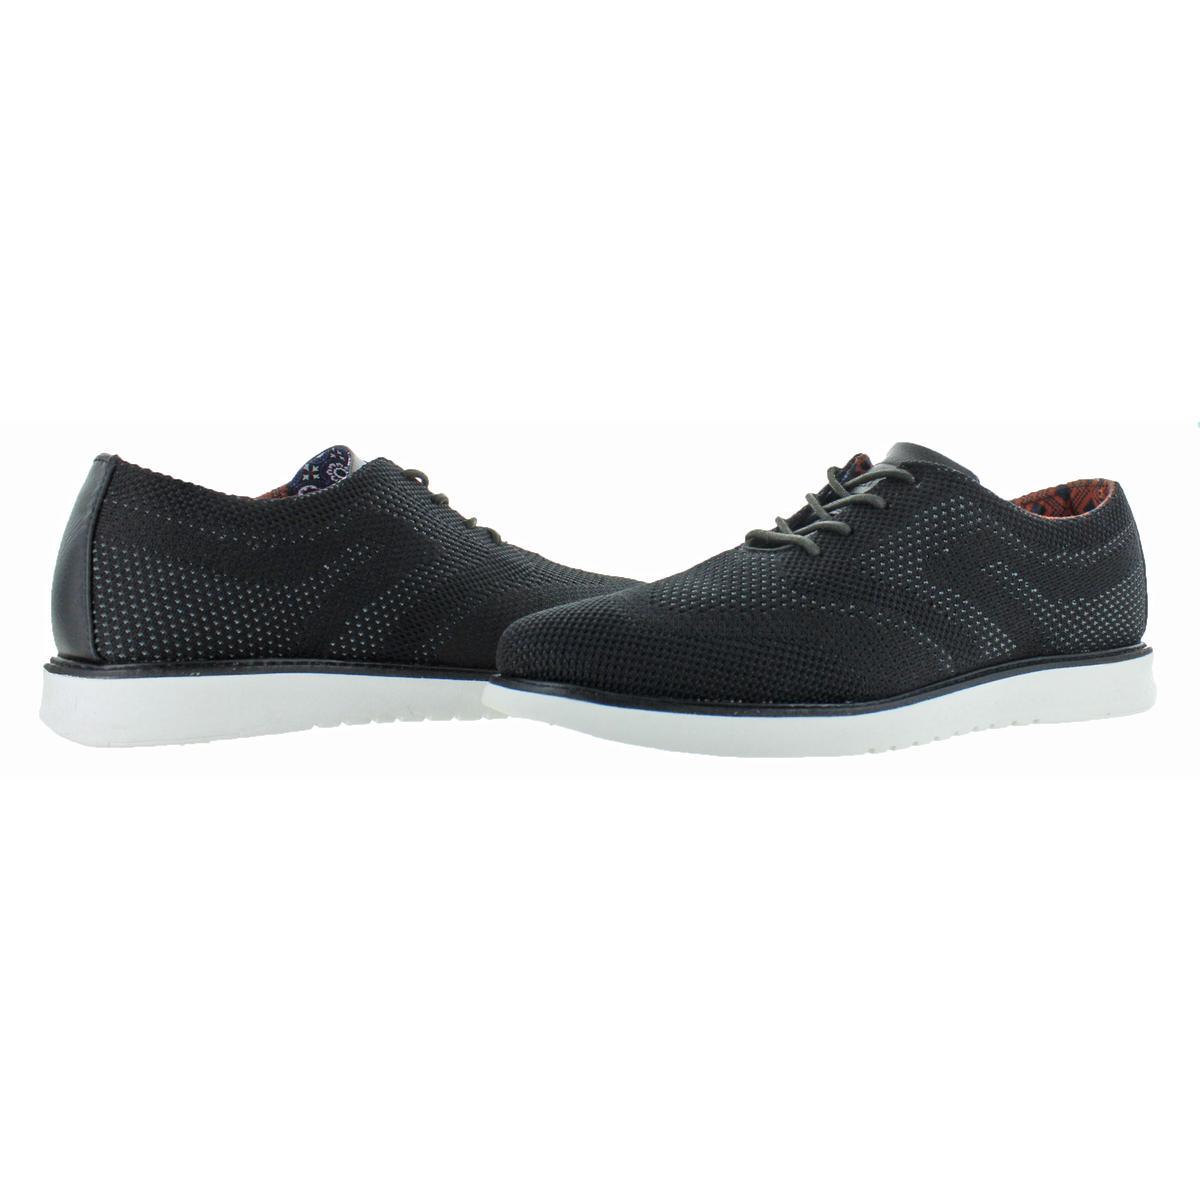 Ben-Sherman-Men-039-s-Omega-Casual-Wingtip-Oxford-Sneakers thumbnail 3